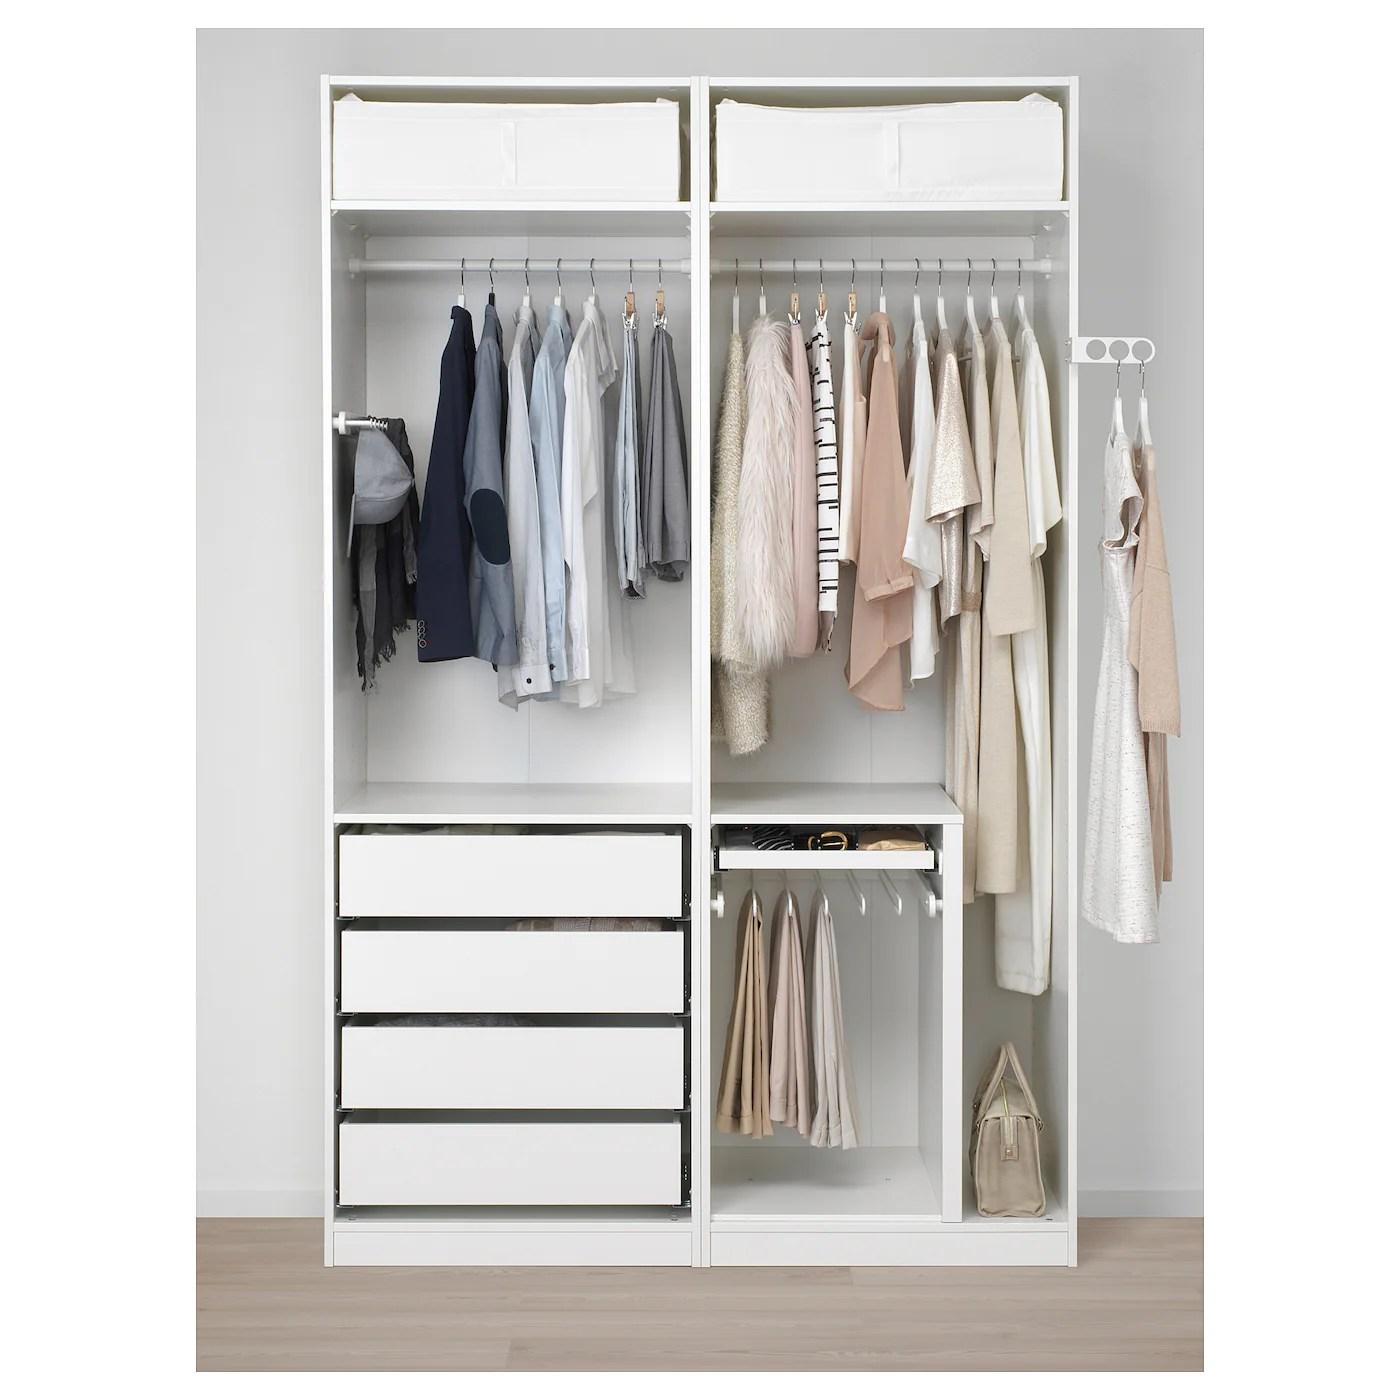 Grosse Kleiderschranke Ikea Express Solutions Schwebeturenschrank